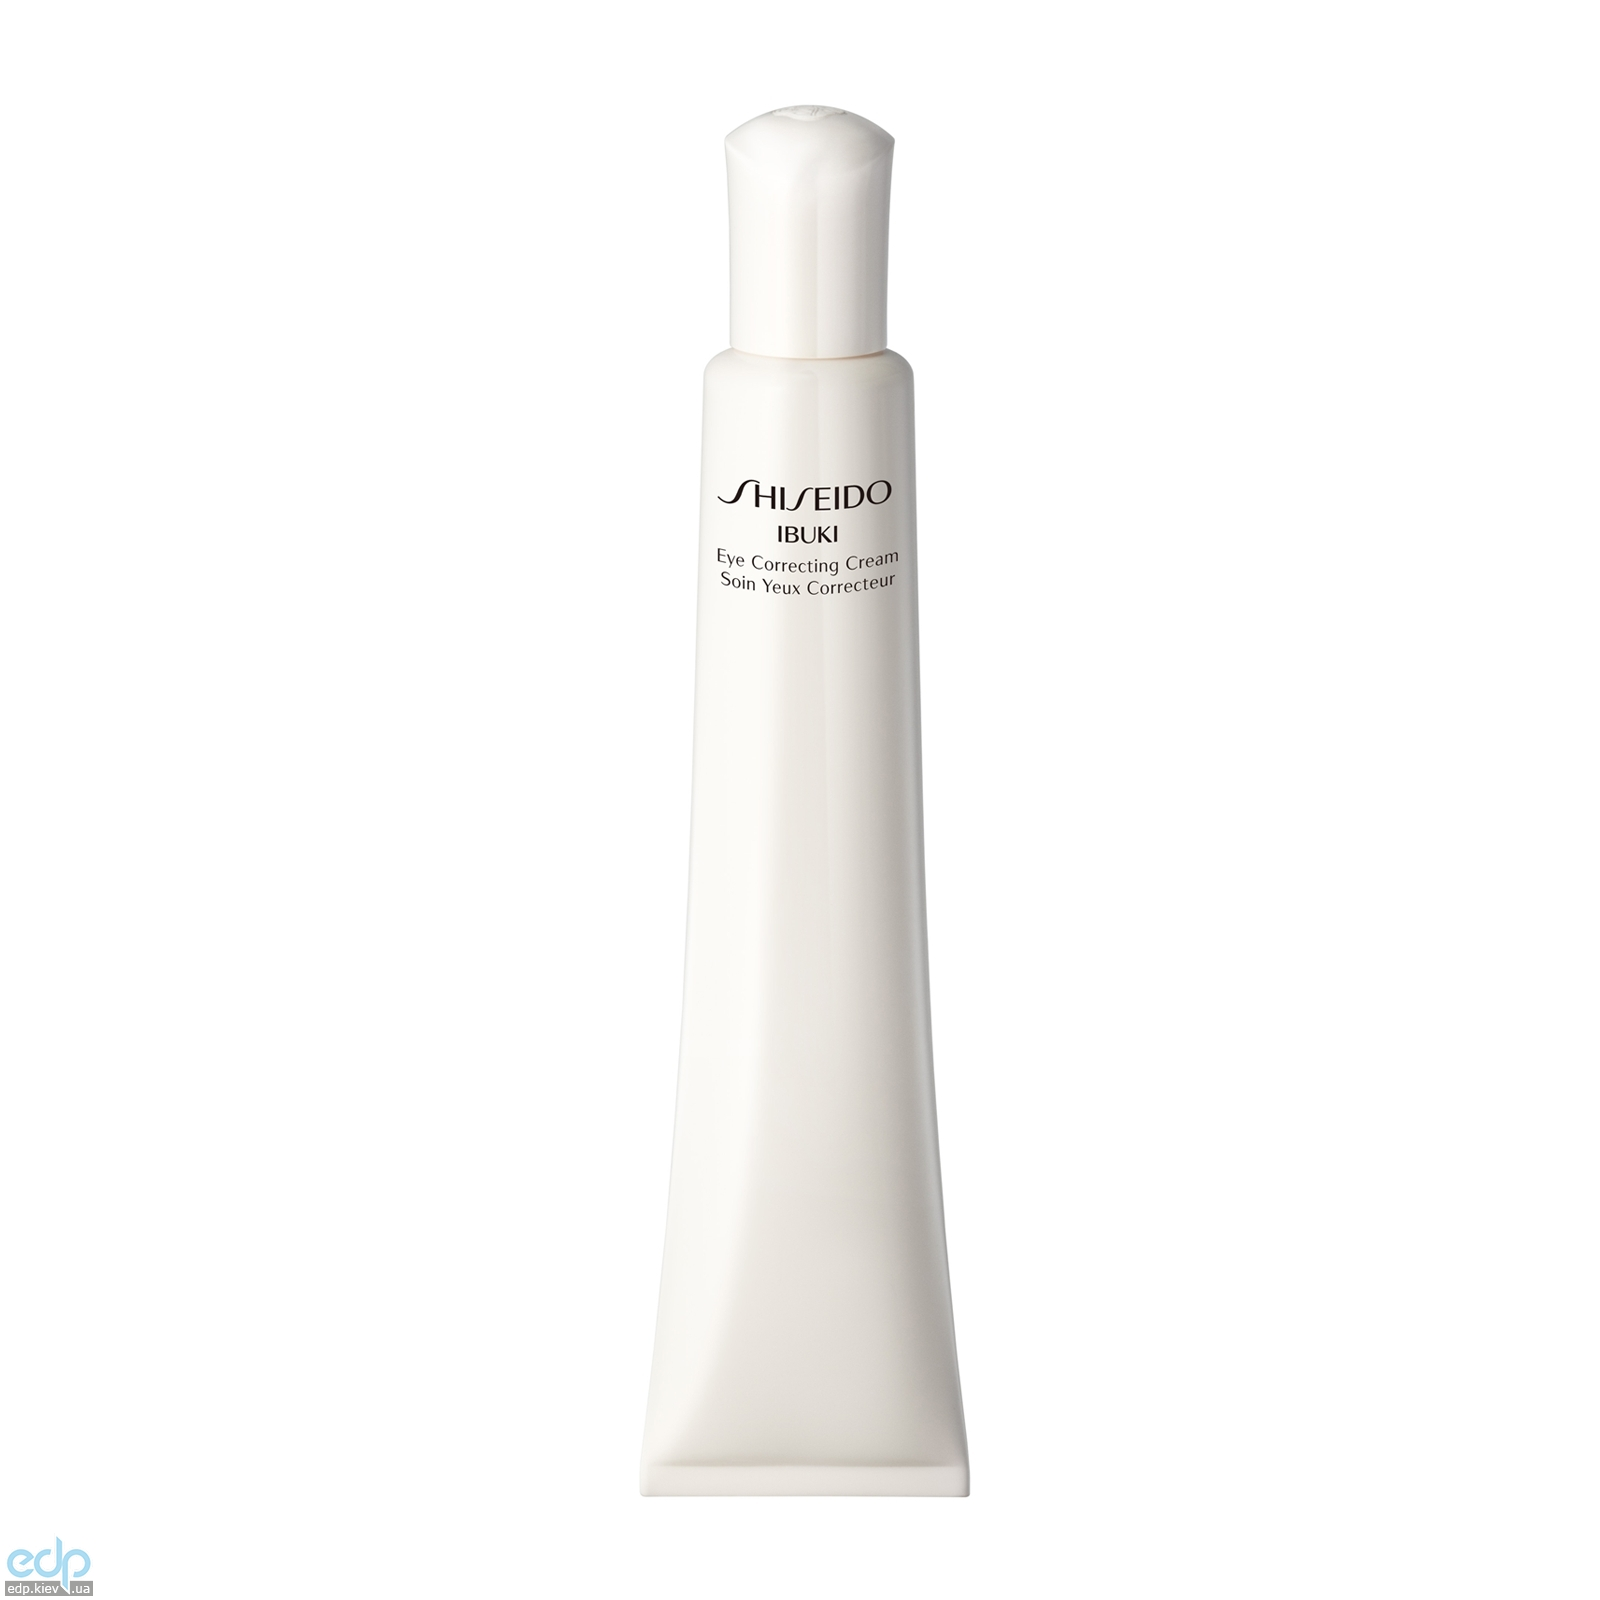 Shiseido - Крем для глаз против признаков усталости кожи Ibuki Eye Correcting Cream - 15 ml